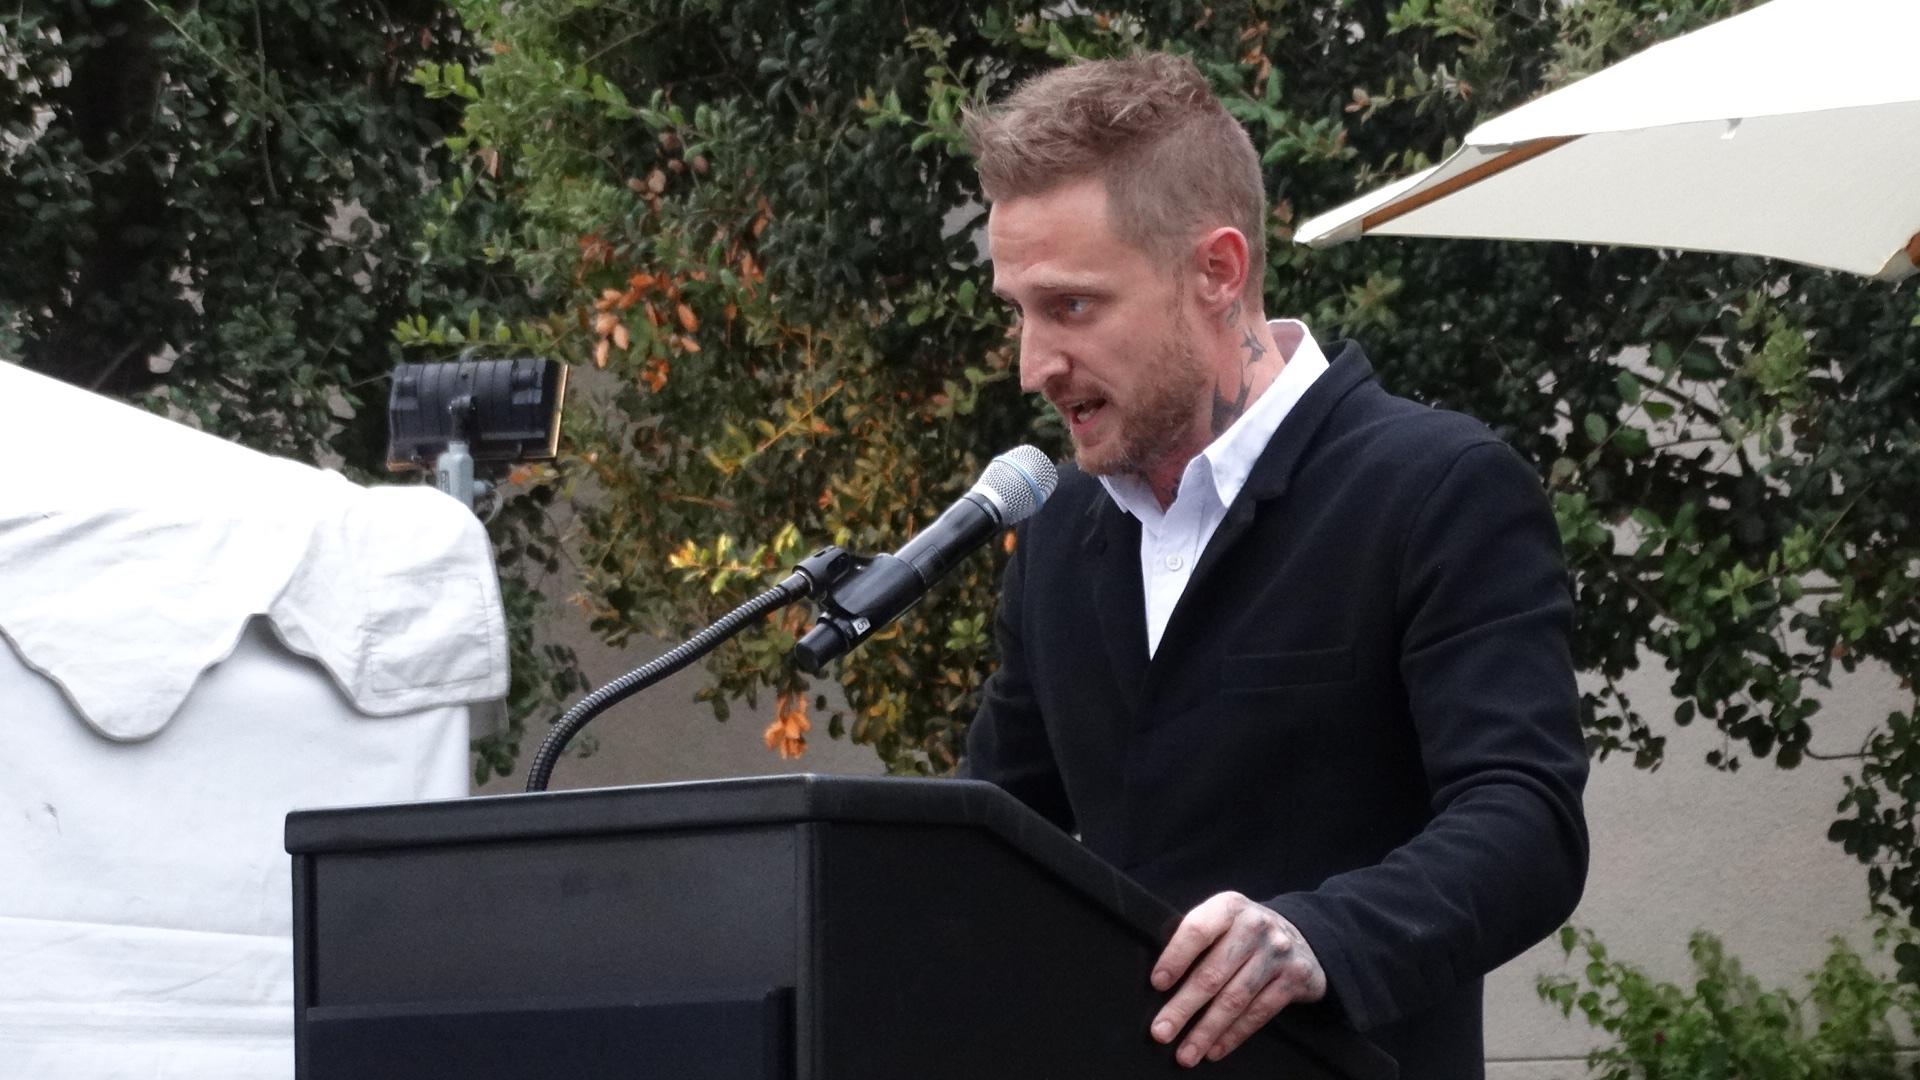 Chef Michael Voltaggio hosting American Cancer Society CalSpirit31 in Los Angeles